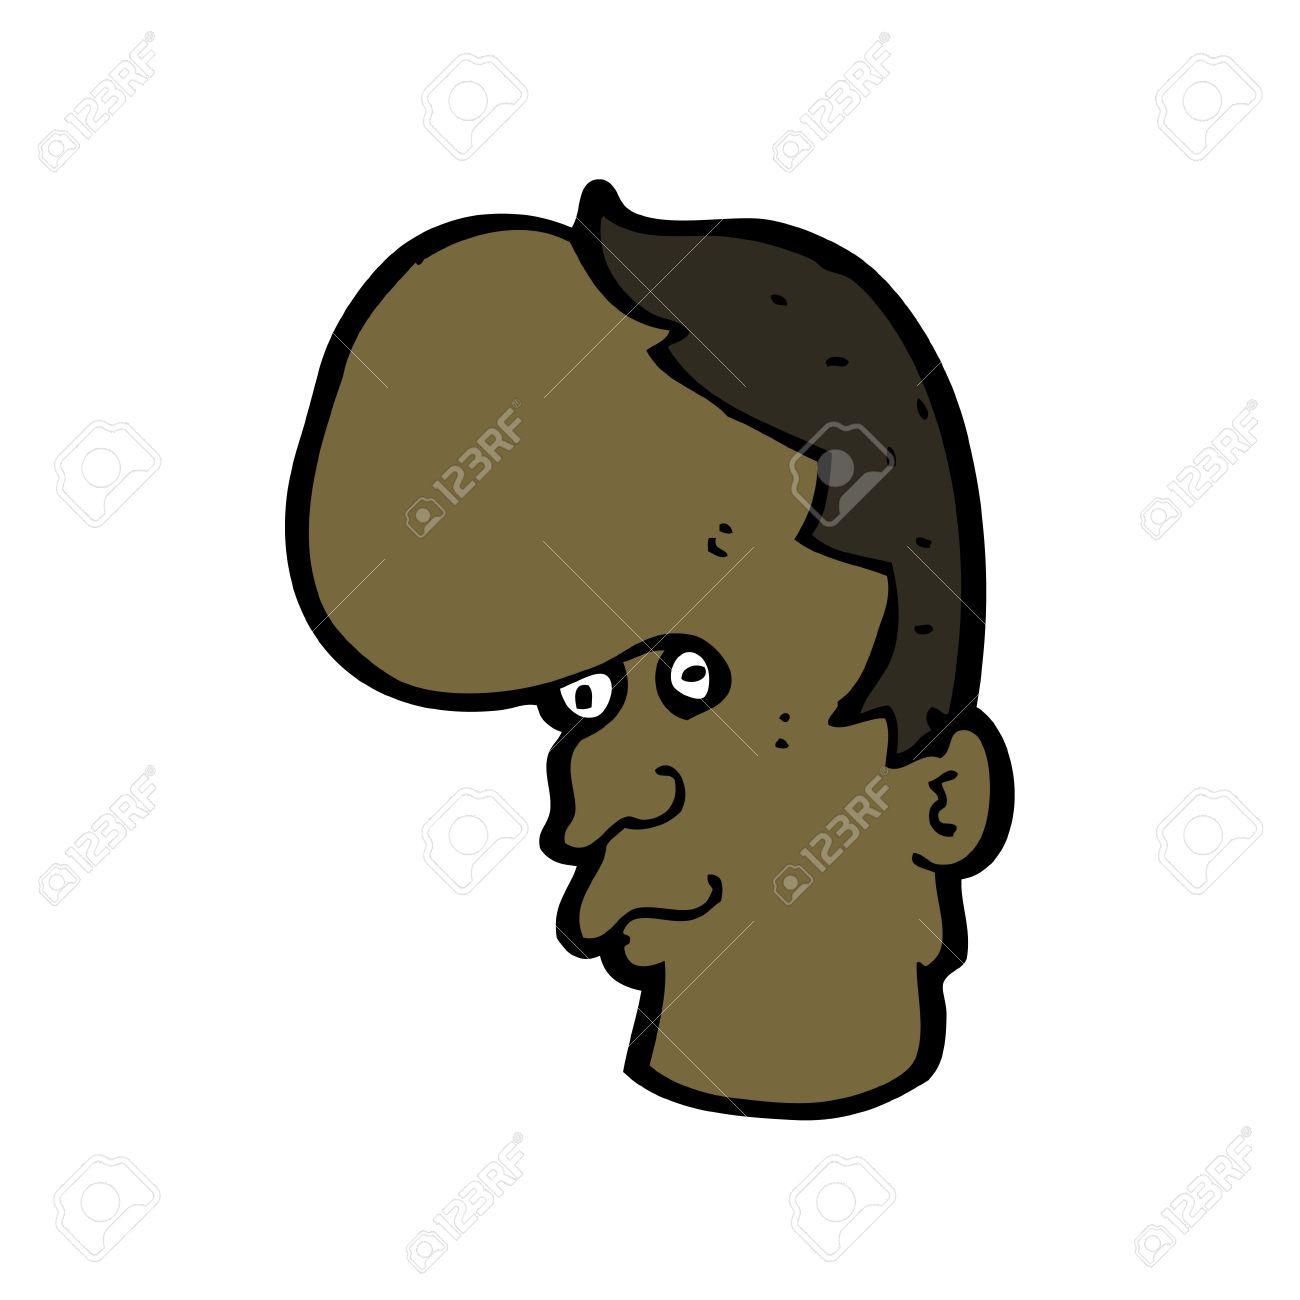 cartoon character of a man with a huge forehead royalty free rh 123rf com big head animated characters big head female cartoon characters